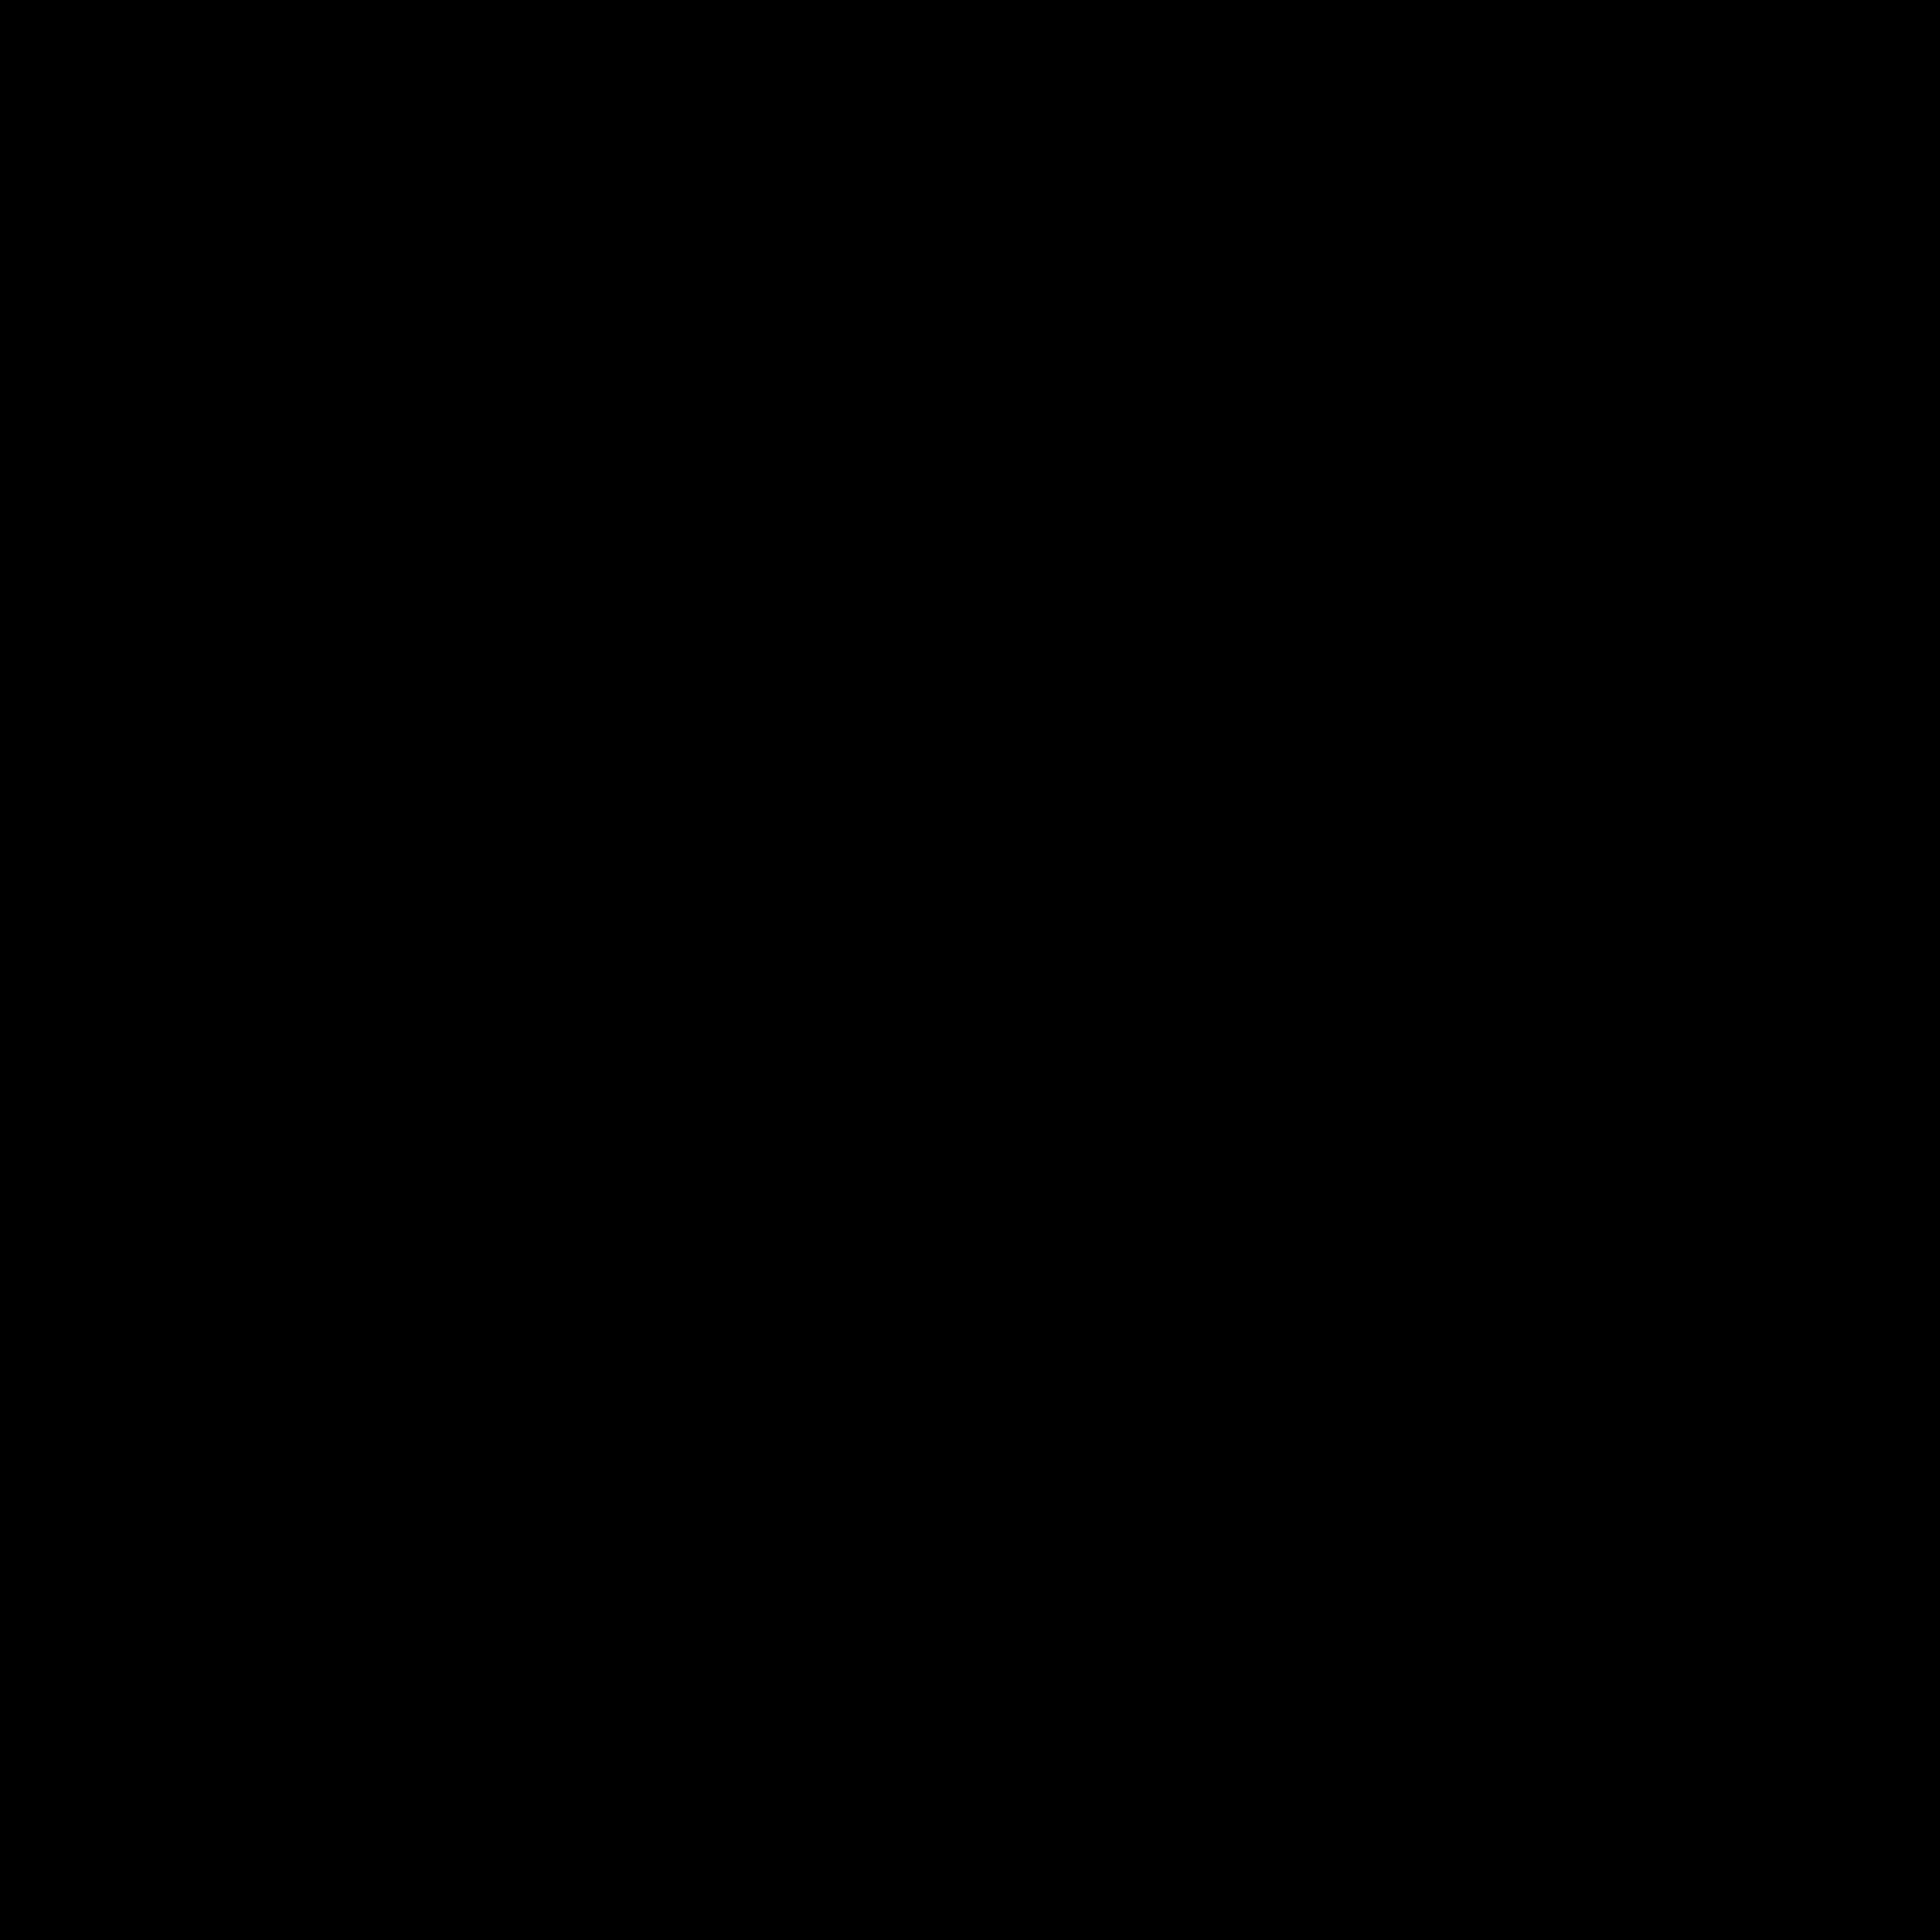 image transparent Mail carrier clipart black and white. Letter c bingo raindanceirrigation